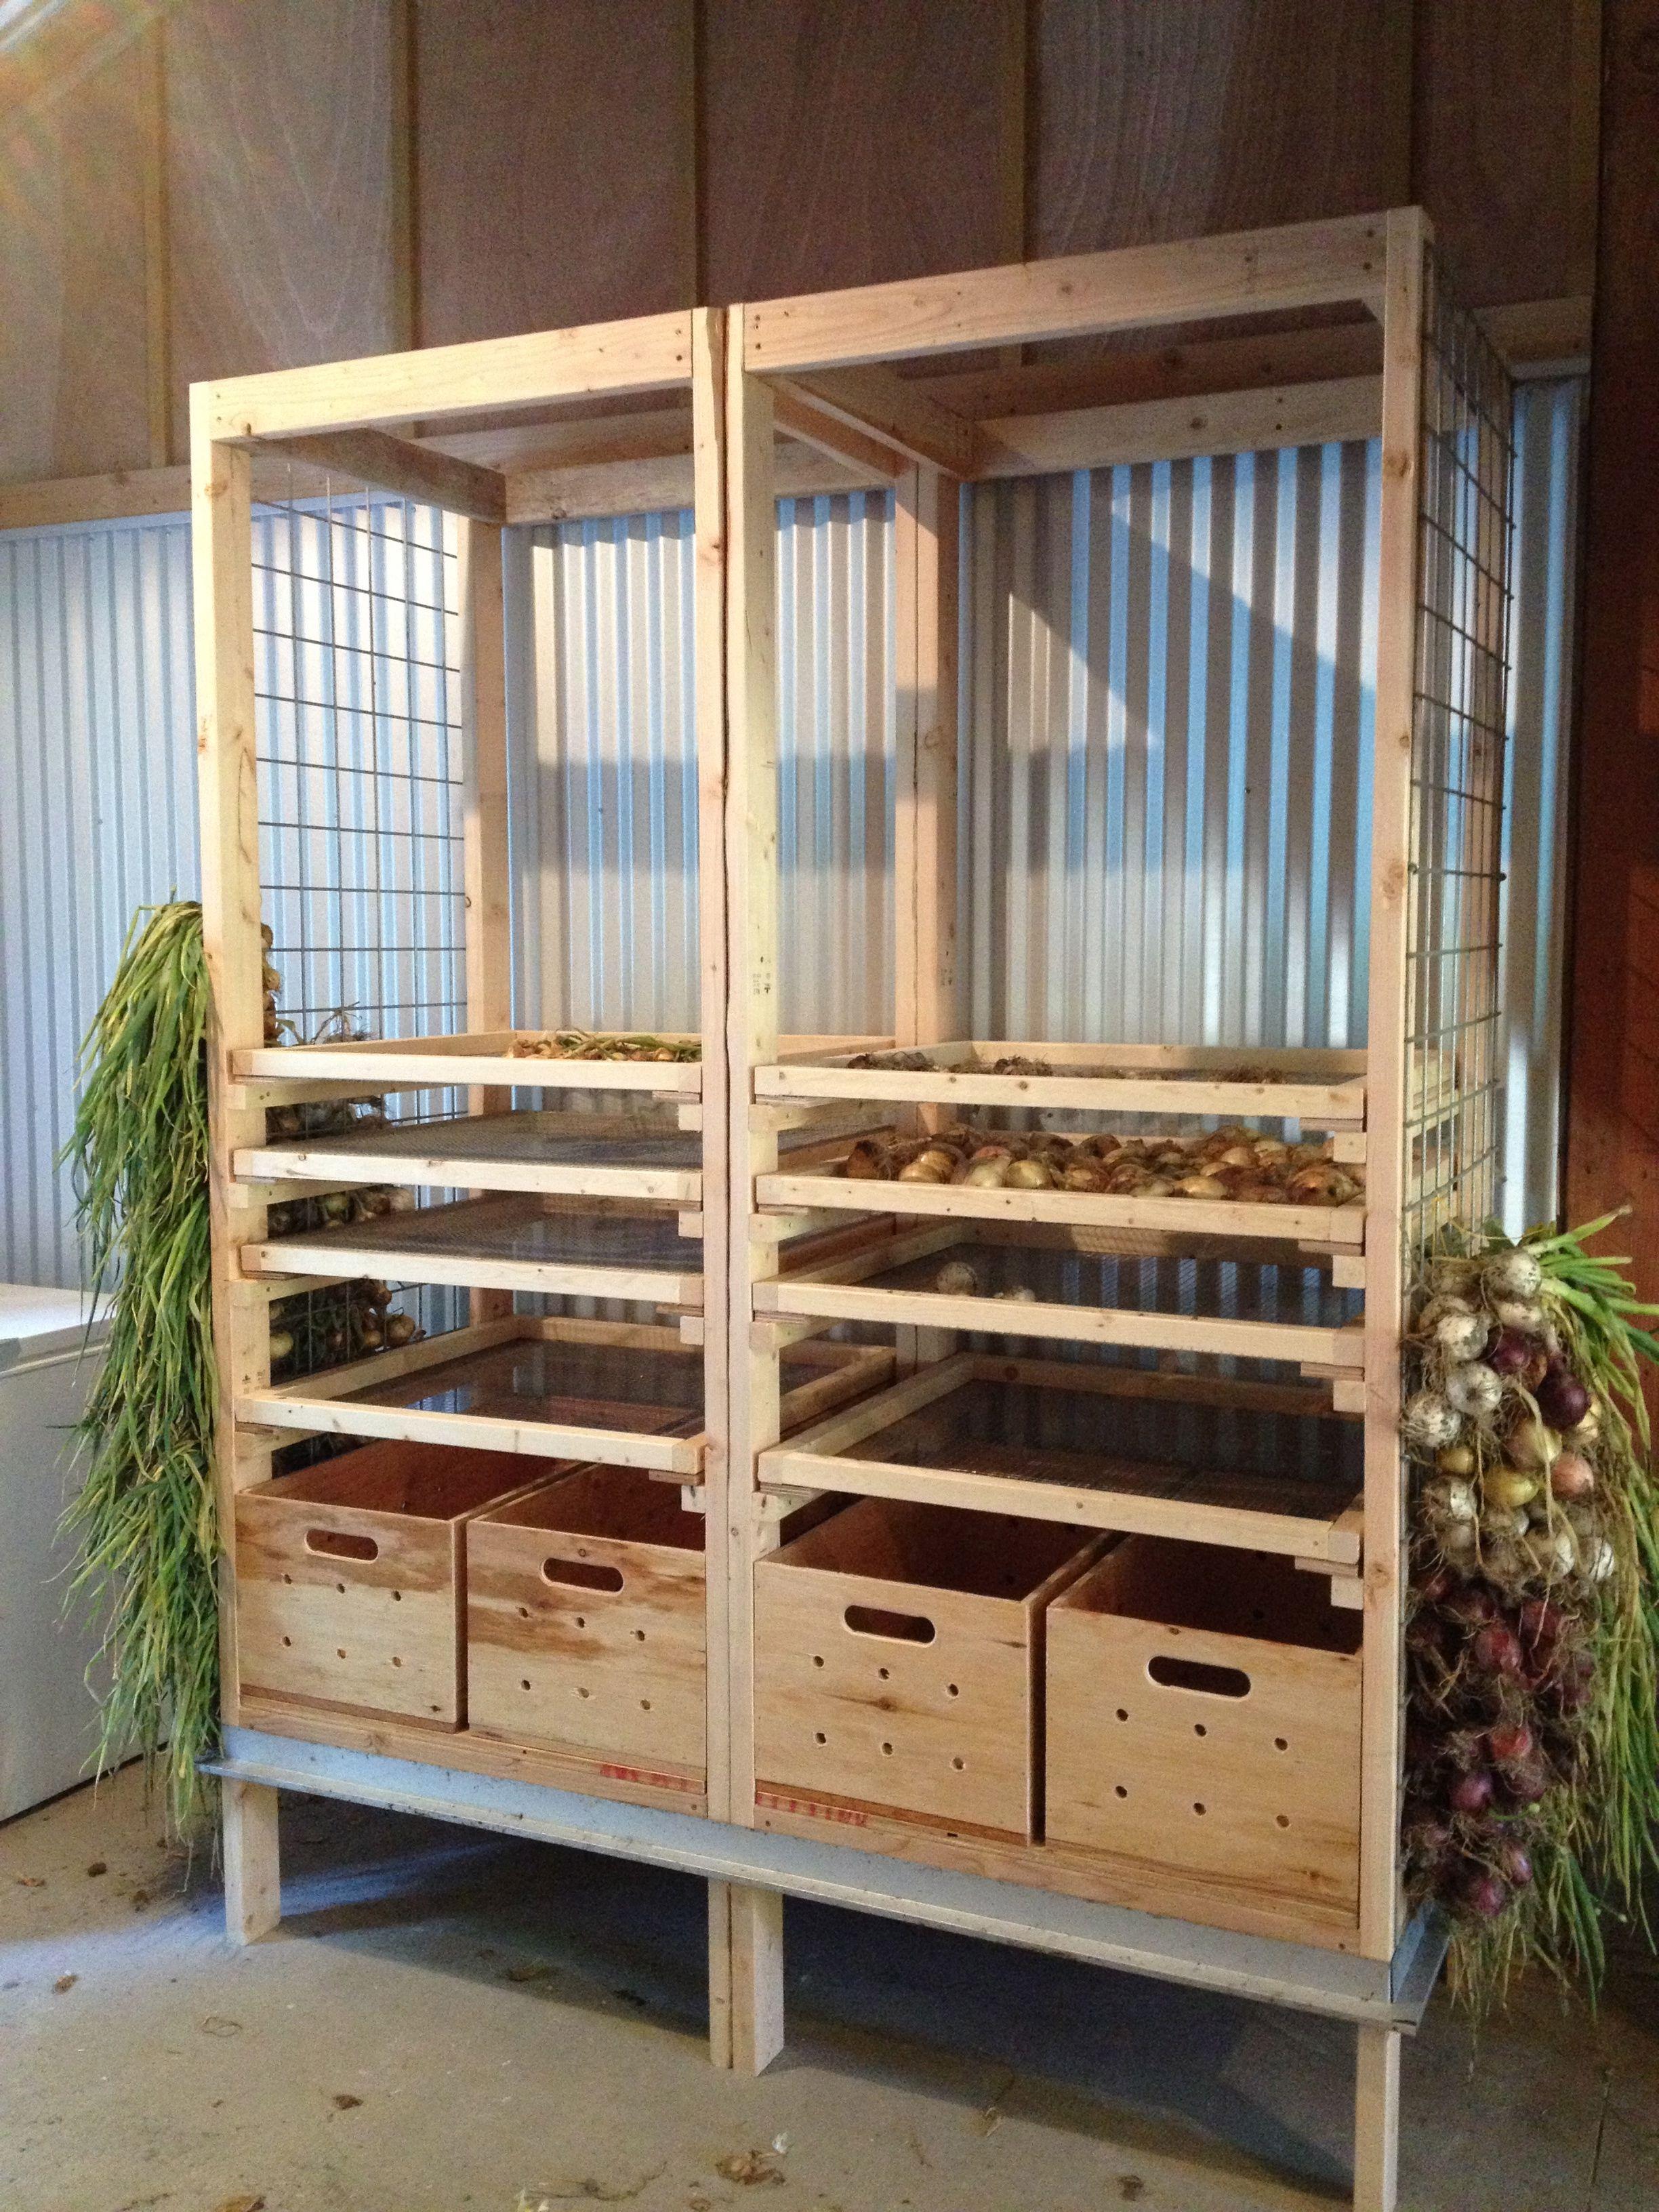 Ultimate Vegetable Storage Potatoes Onions Garlic